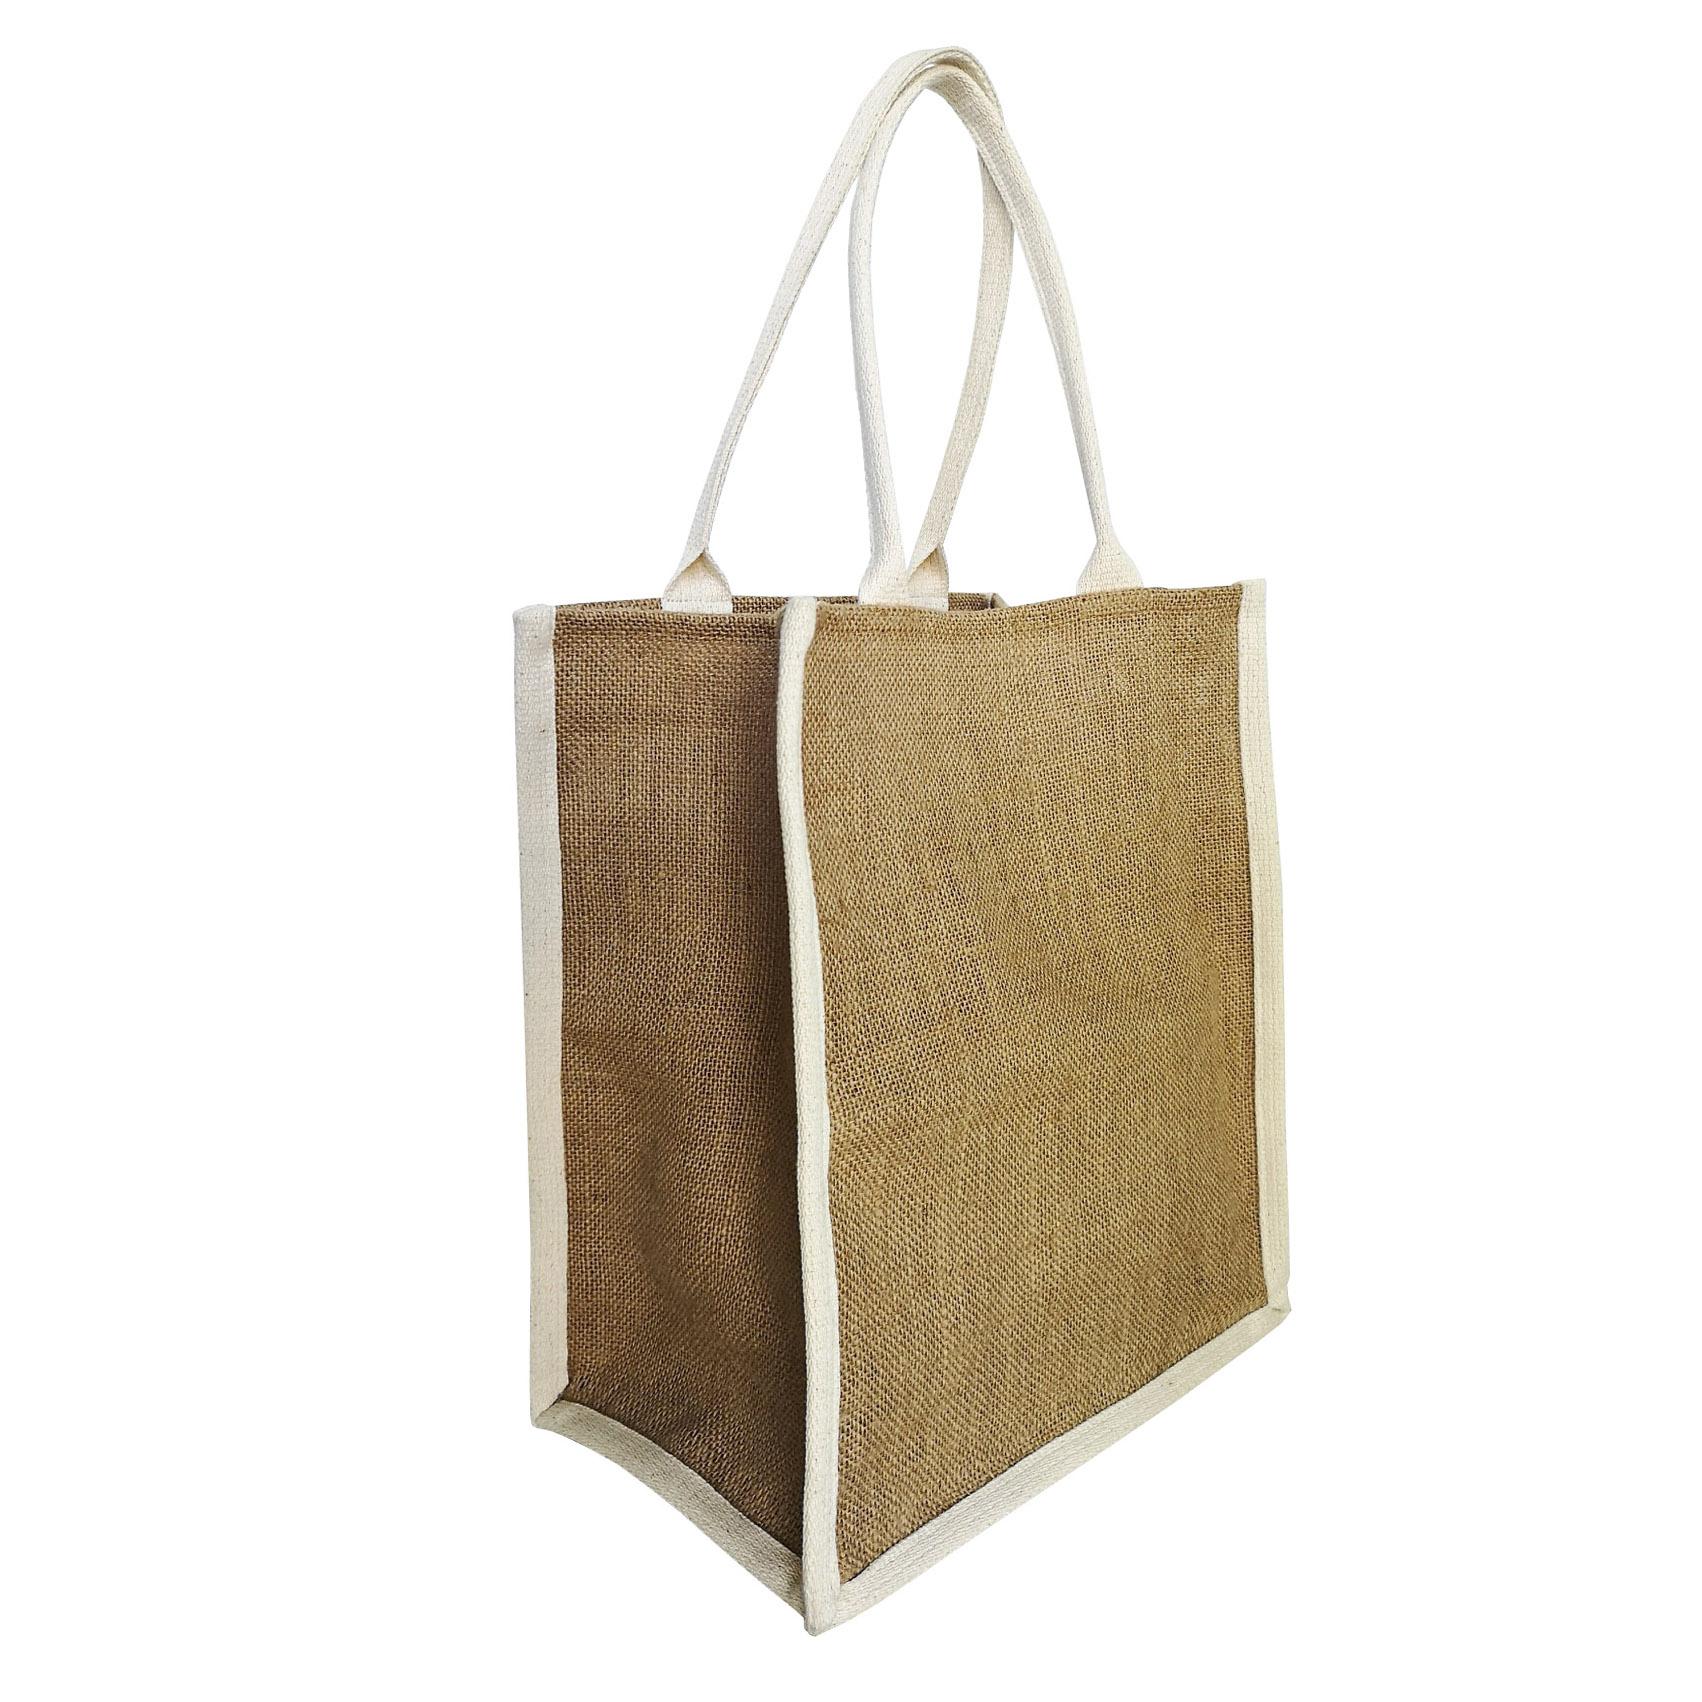 Large jute bags